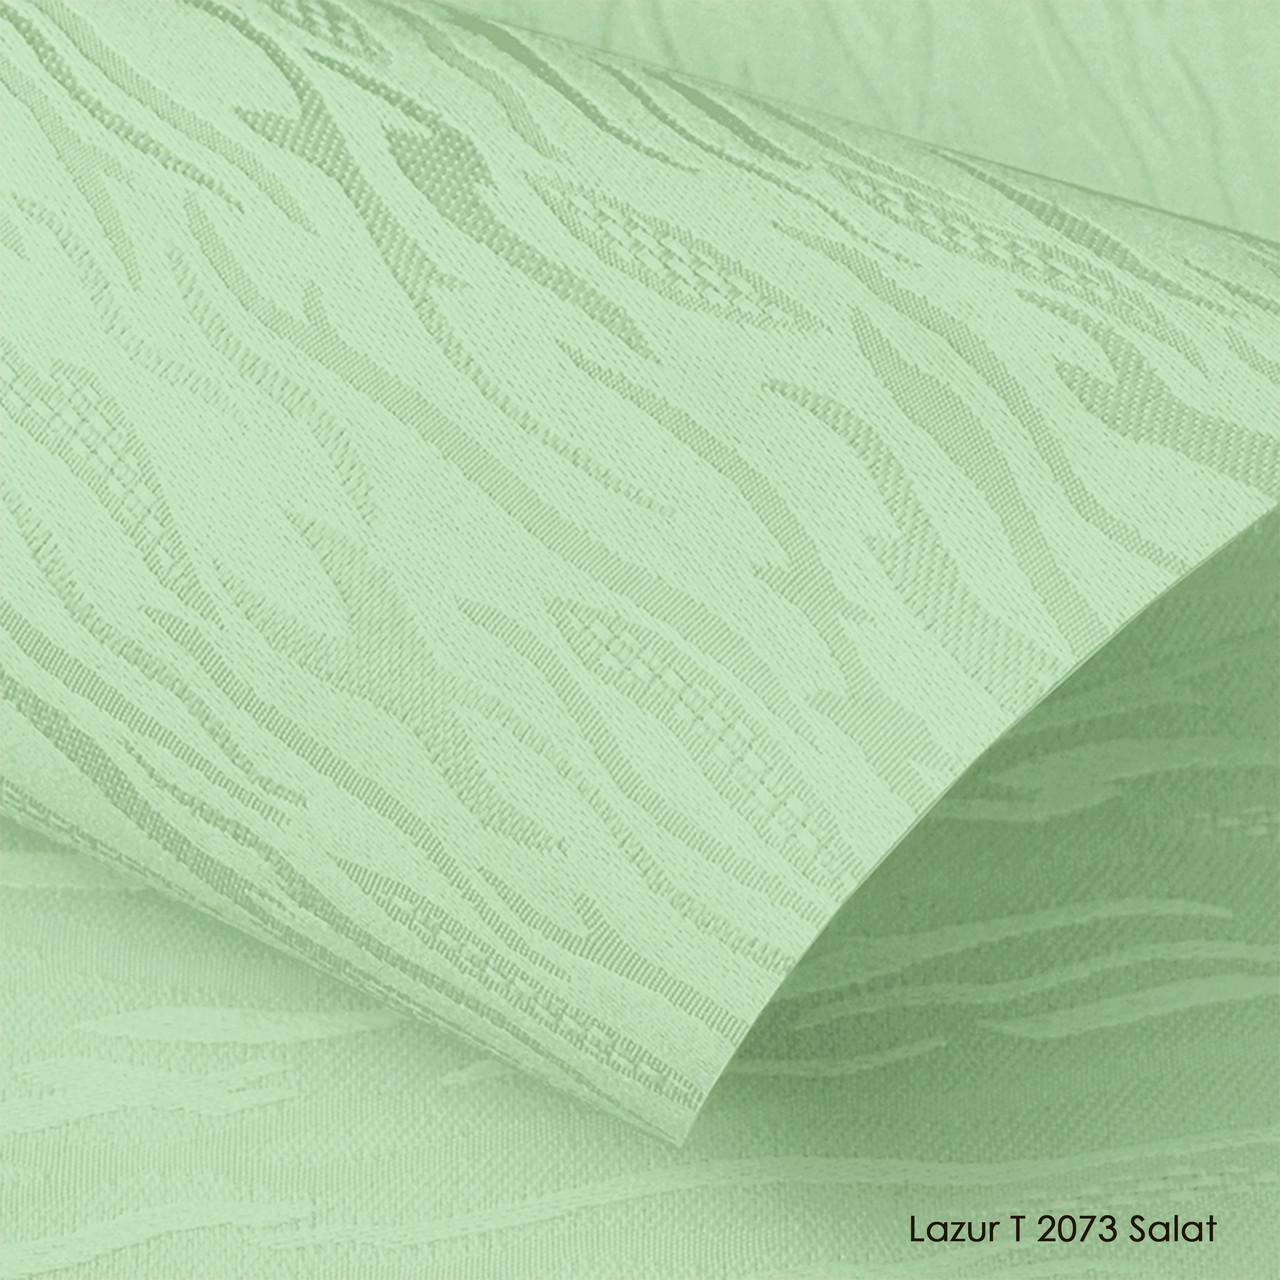 Ролеты тканевые Lazur T 2073 Salat